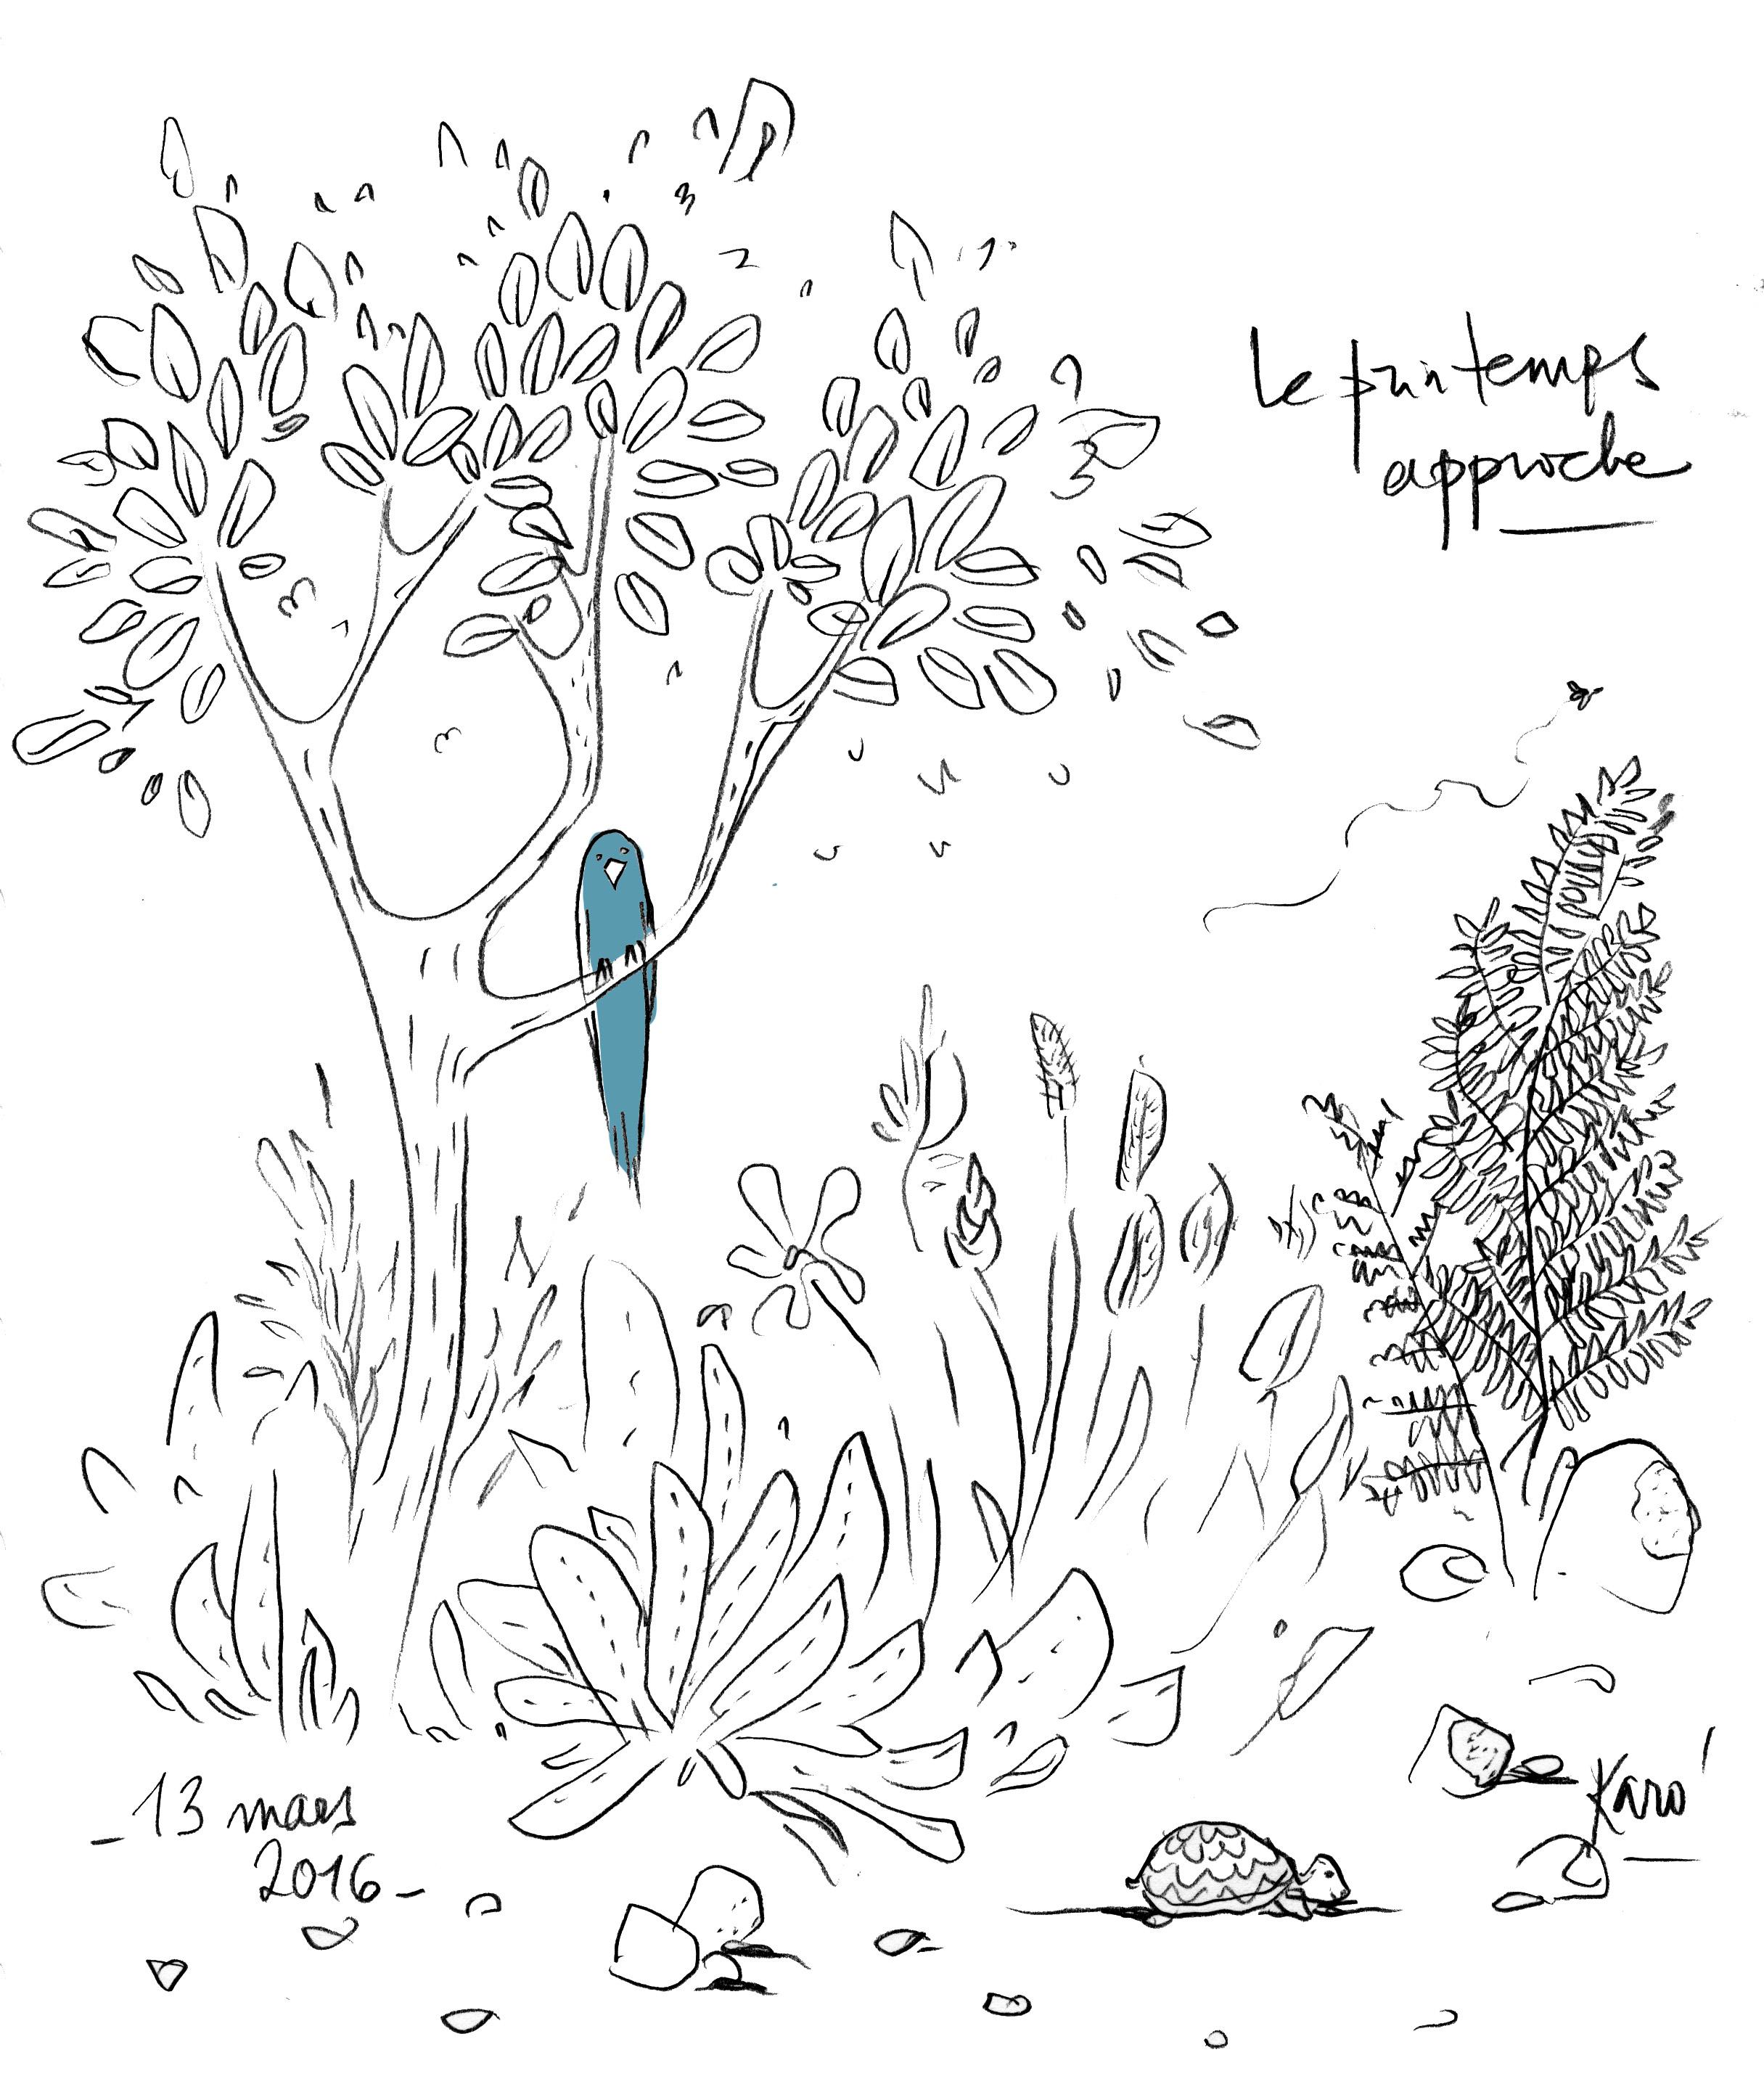 Dessin_du_Vendredi_Karo_Pauwels_illustration_Bruxelles_13mars2016